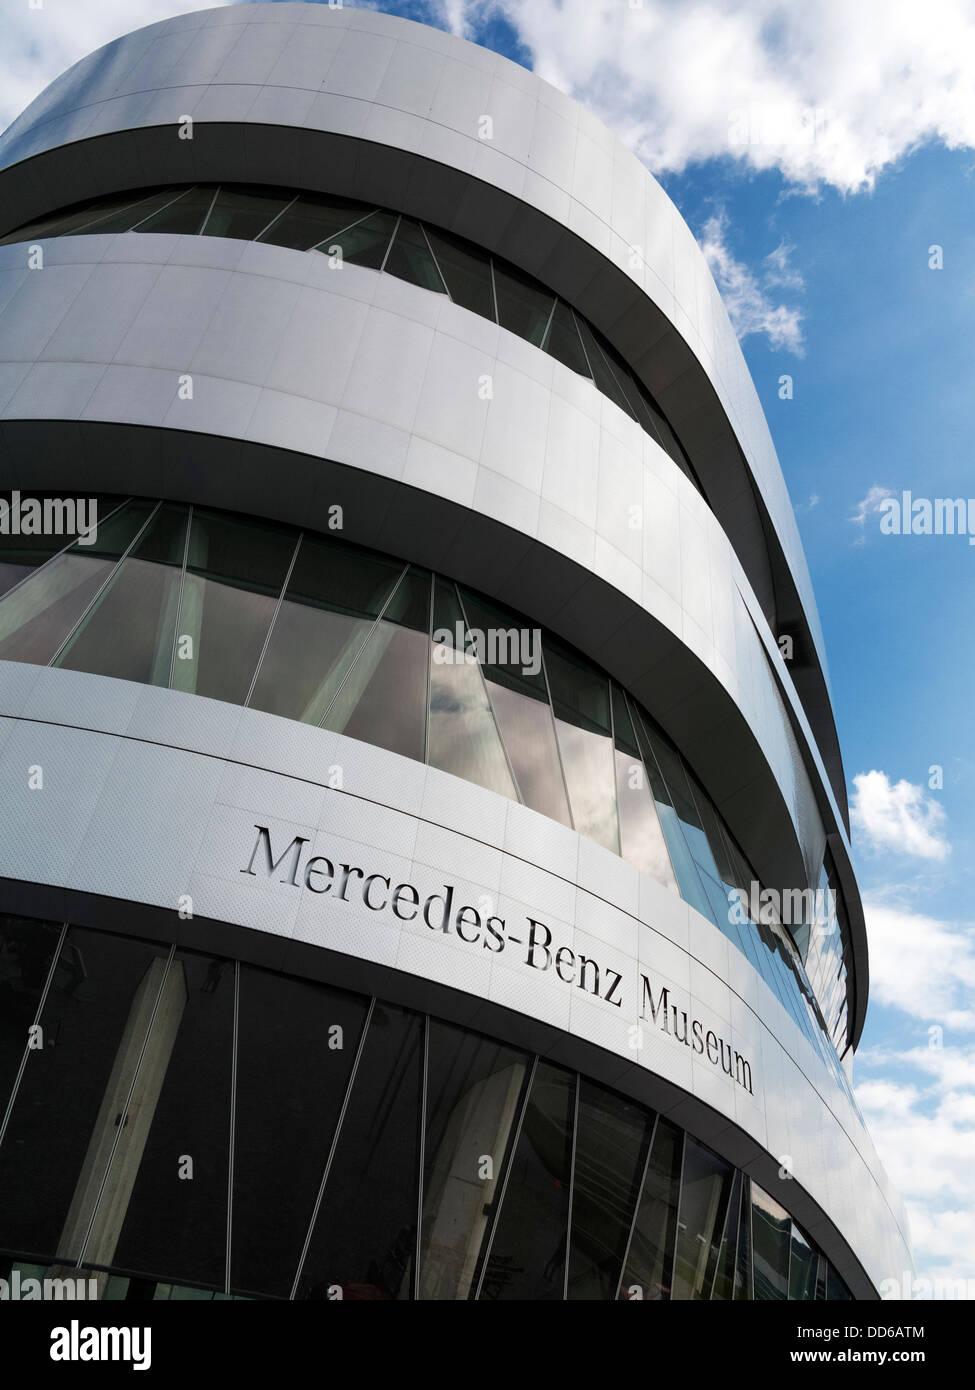 The Mercedes Benz Museum, Stuttgart, Germany - Stock Image